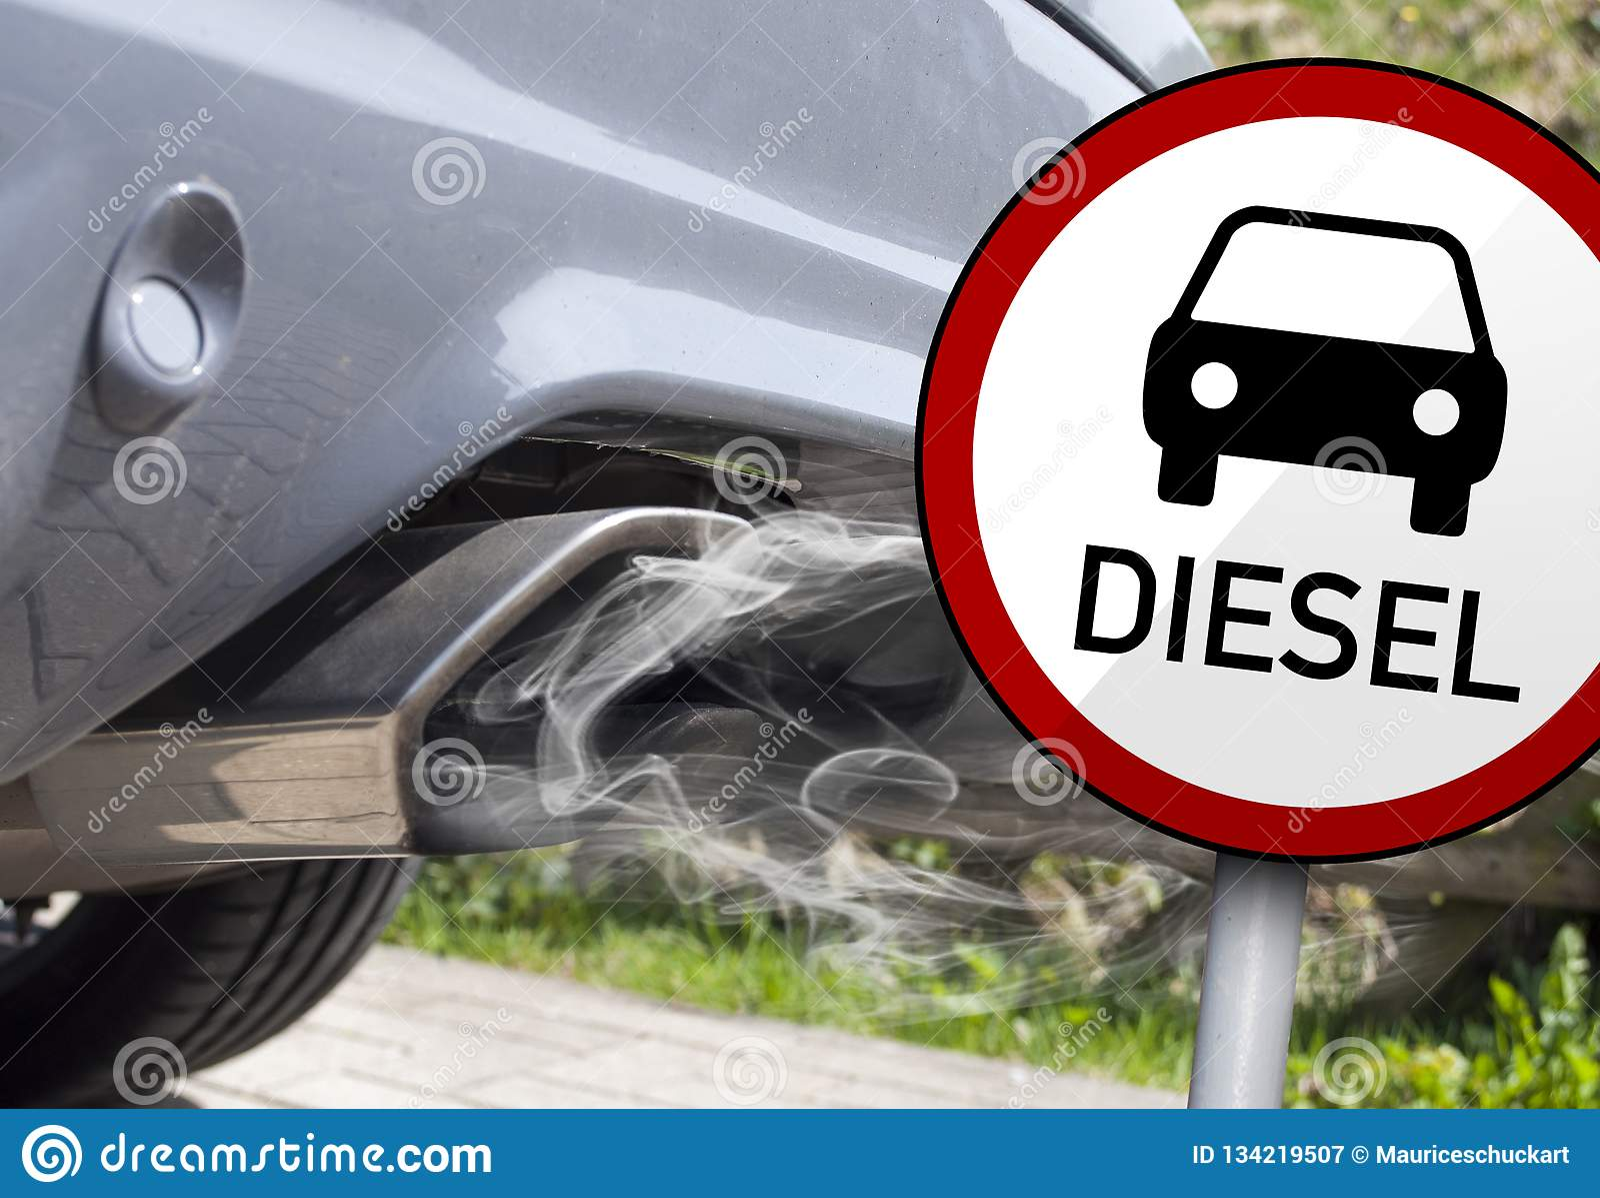 Diesel ban and diesel manupilation in germany